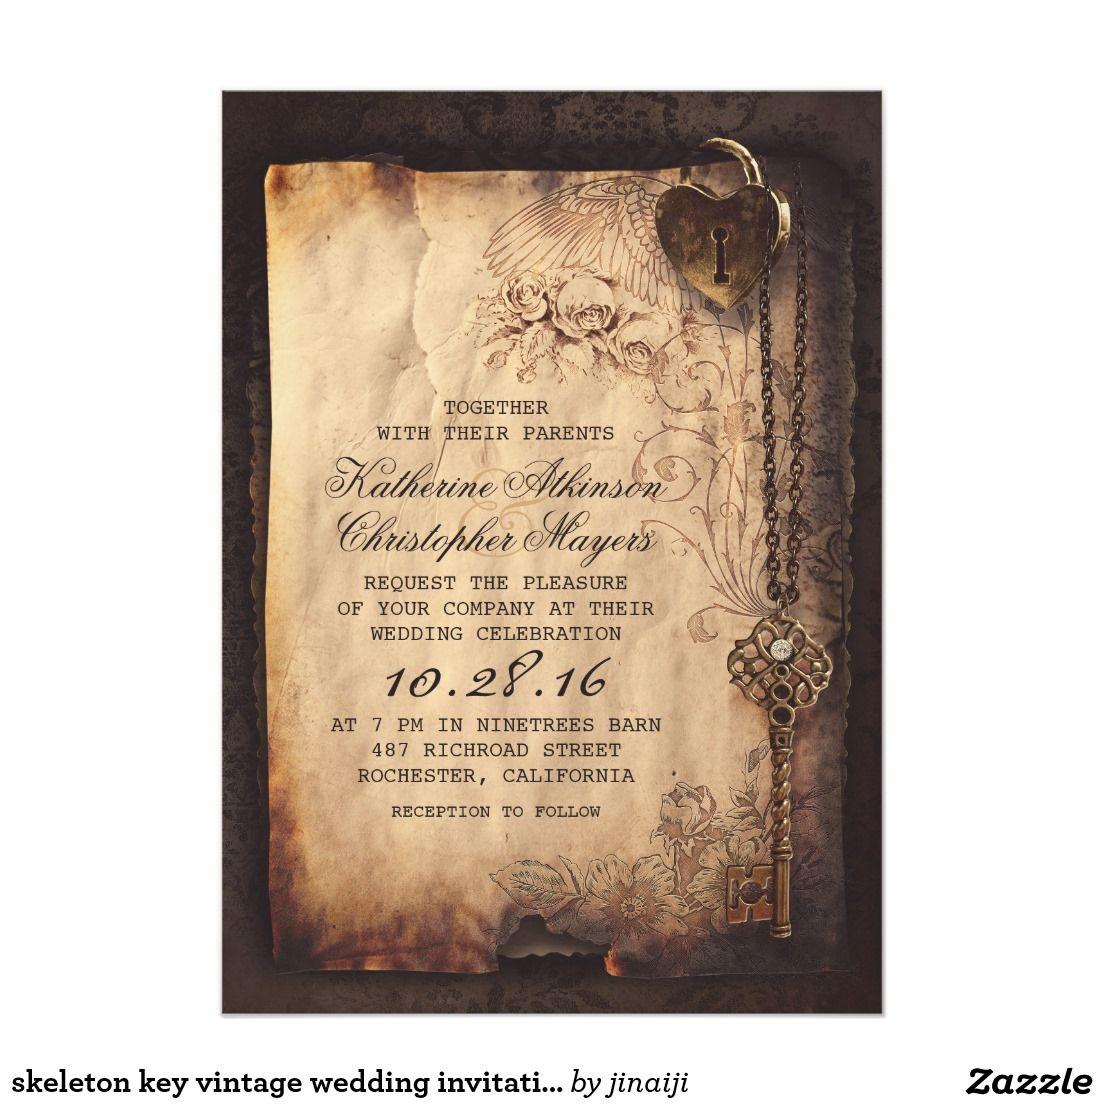 Old Skeleton Key Vintage and Gothic Wedding Card | Vintage wedding ...